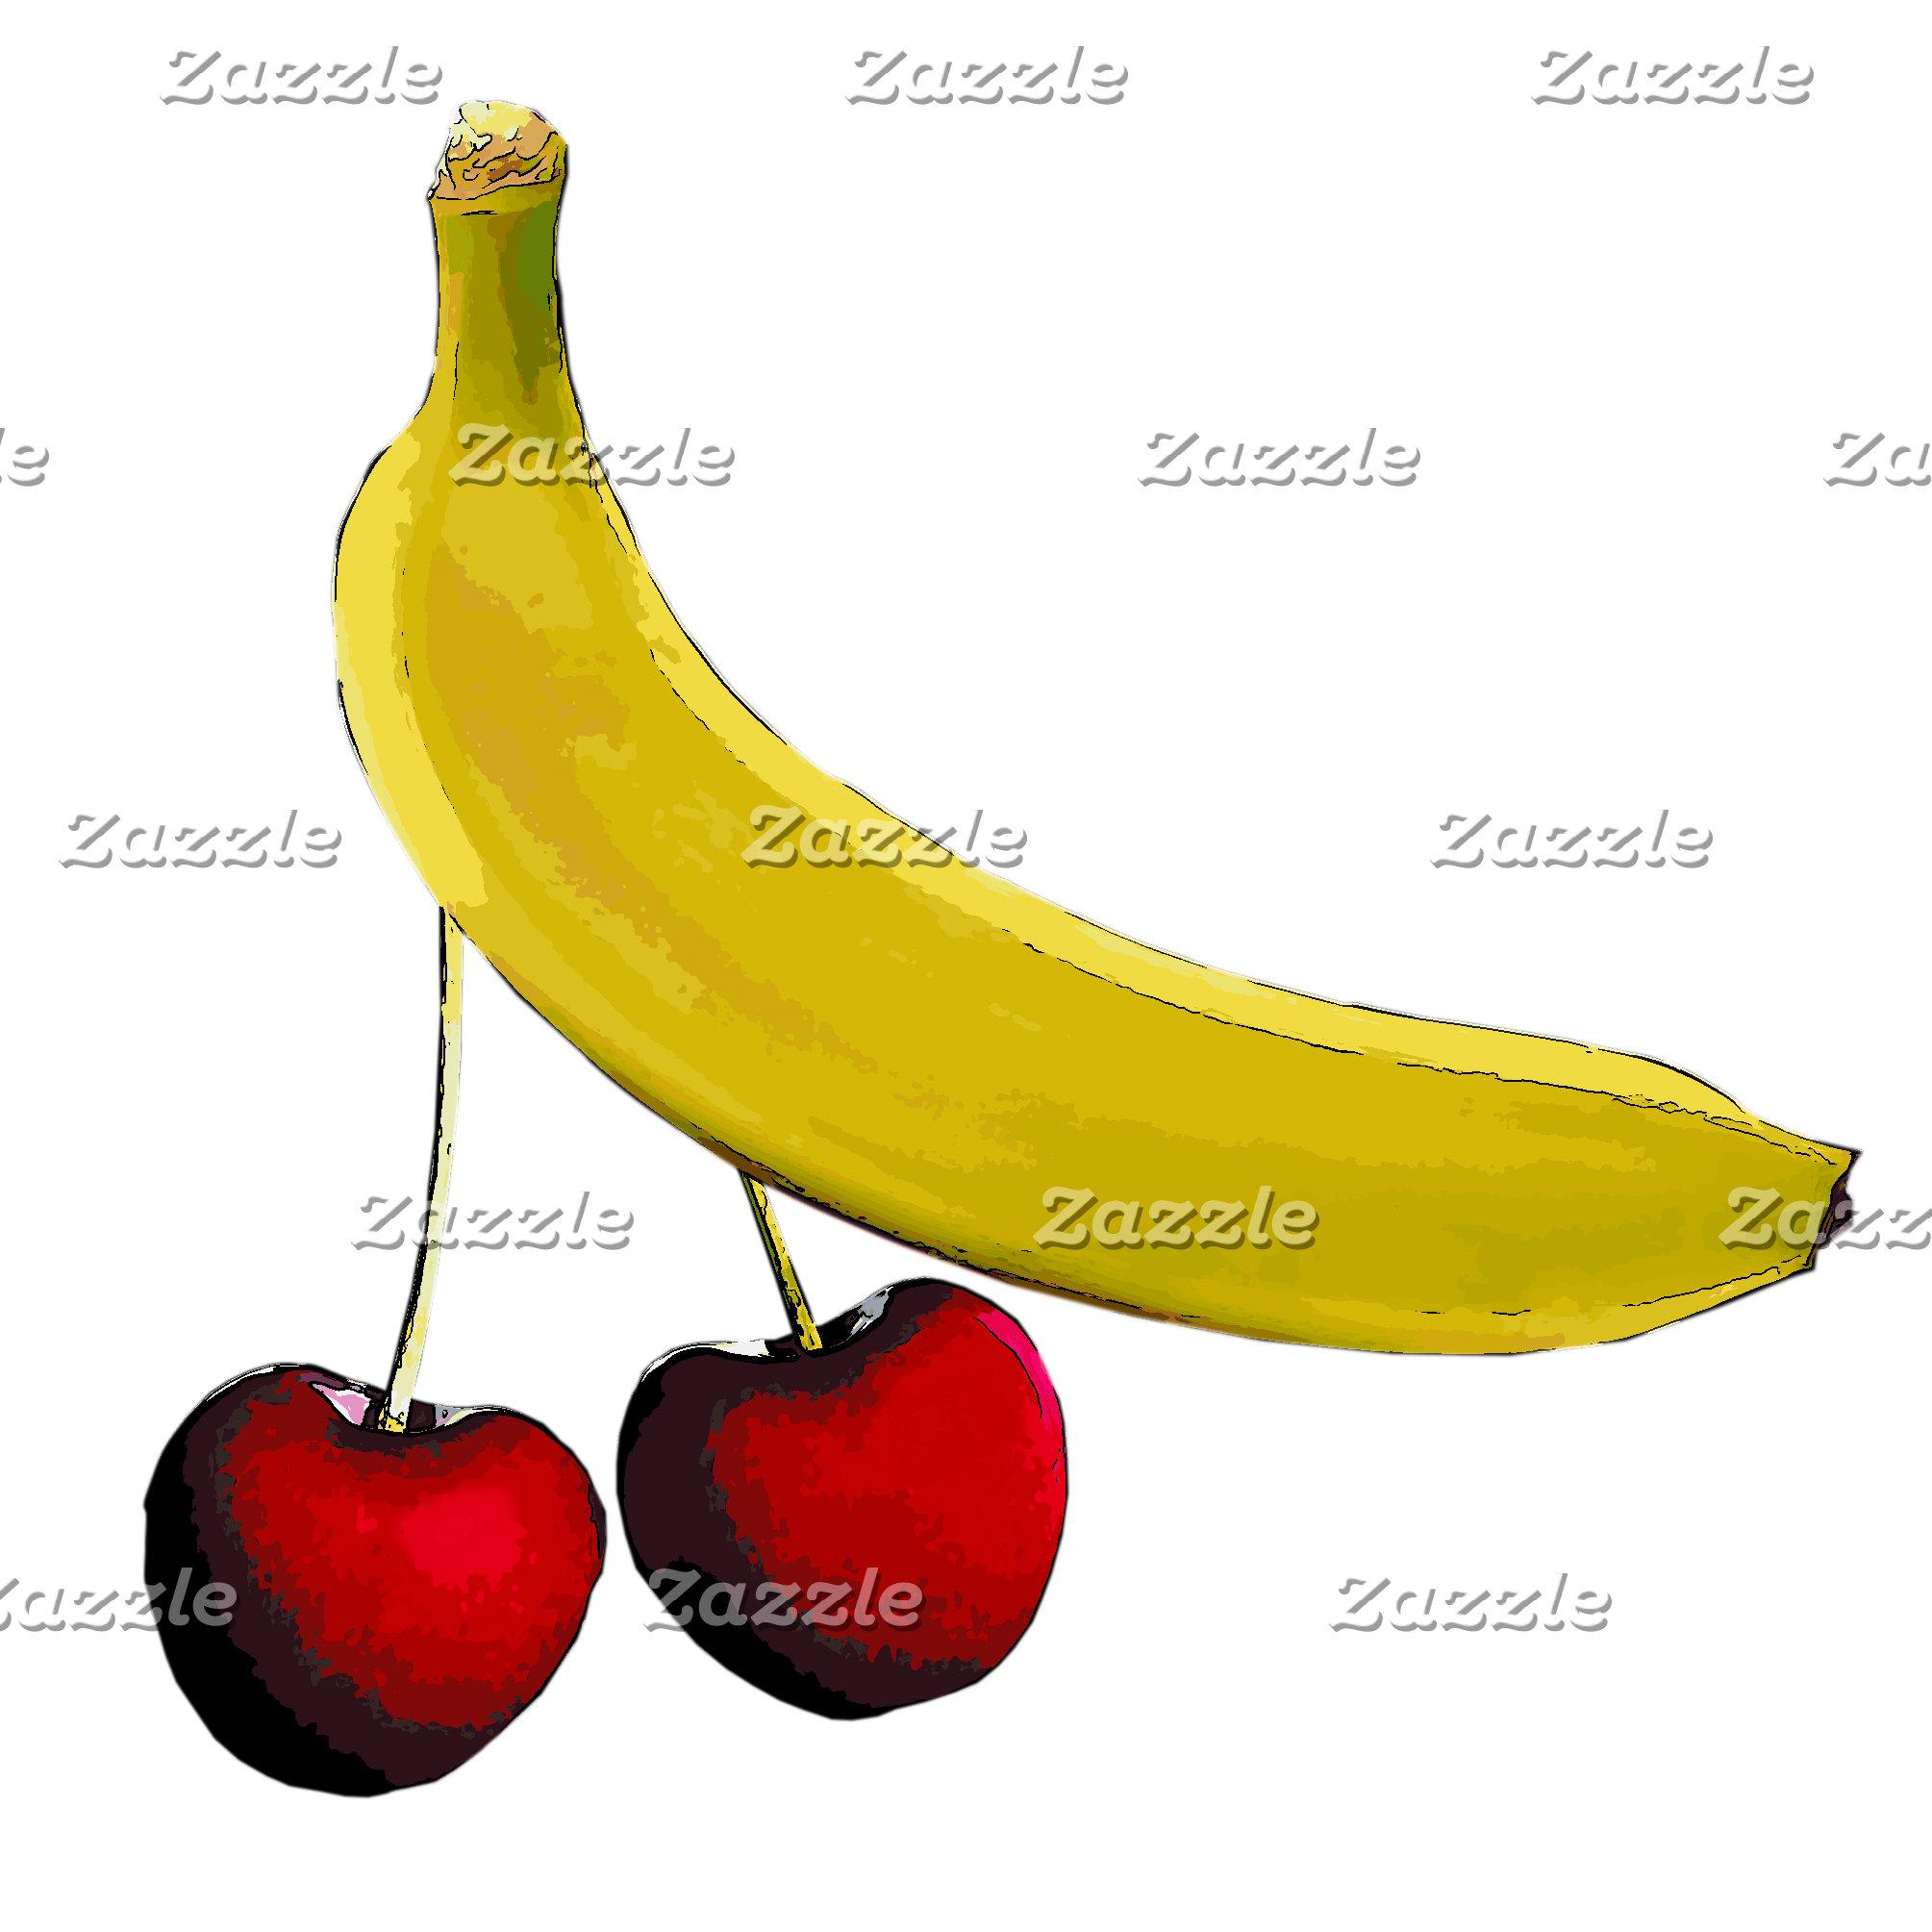 Funny banana T shirt and funny banana gift ideas